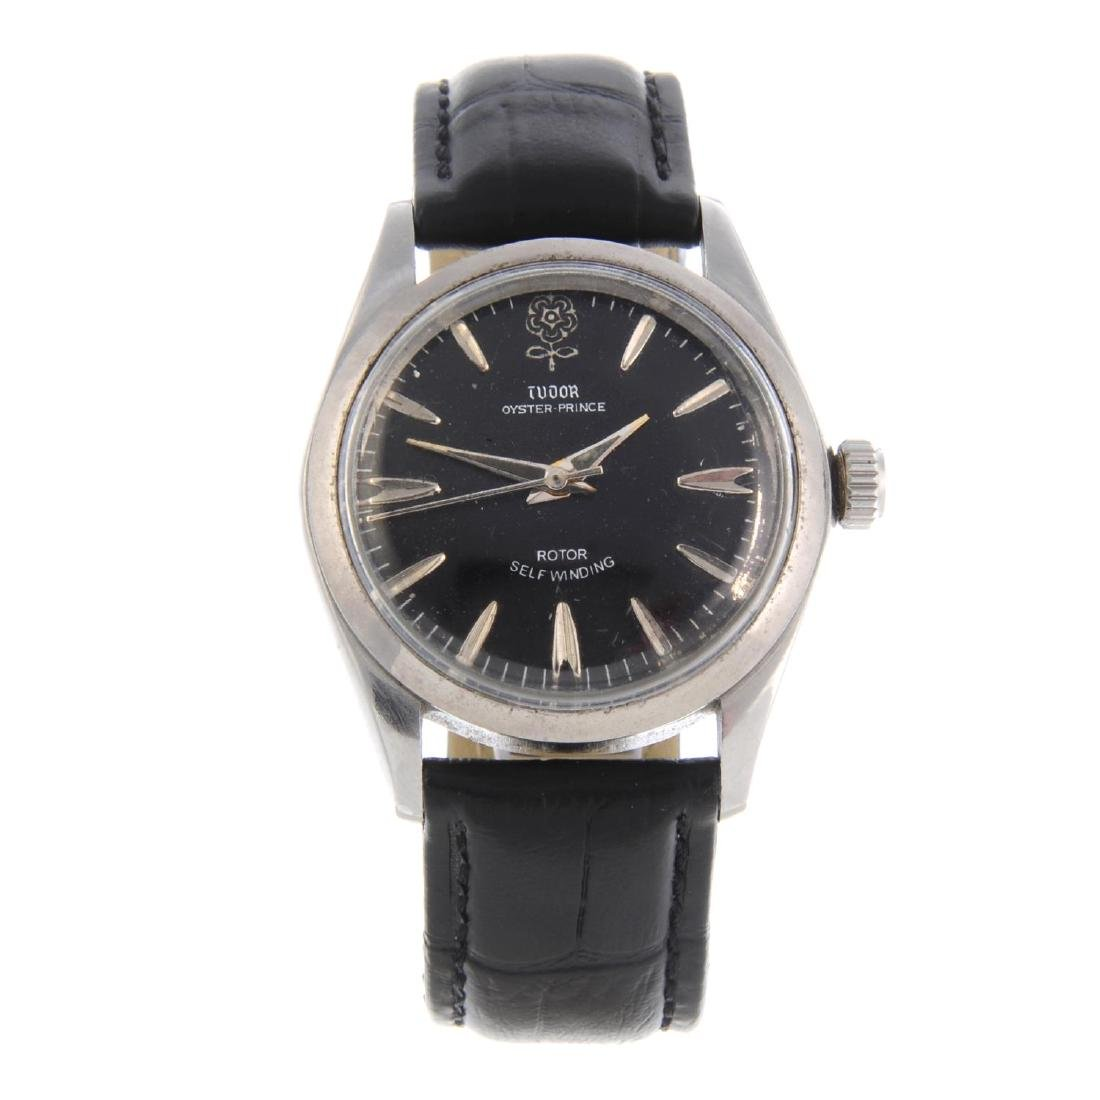 TUDOR - a gentleman's Oyster-Prince wrist watch.